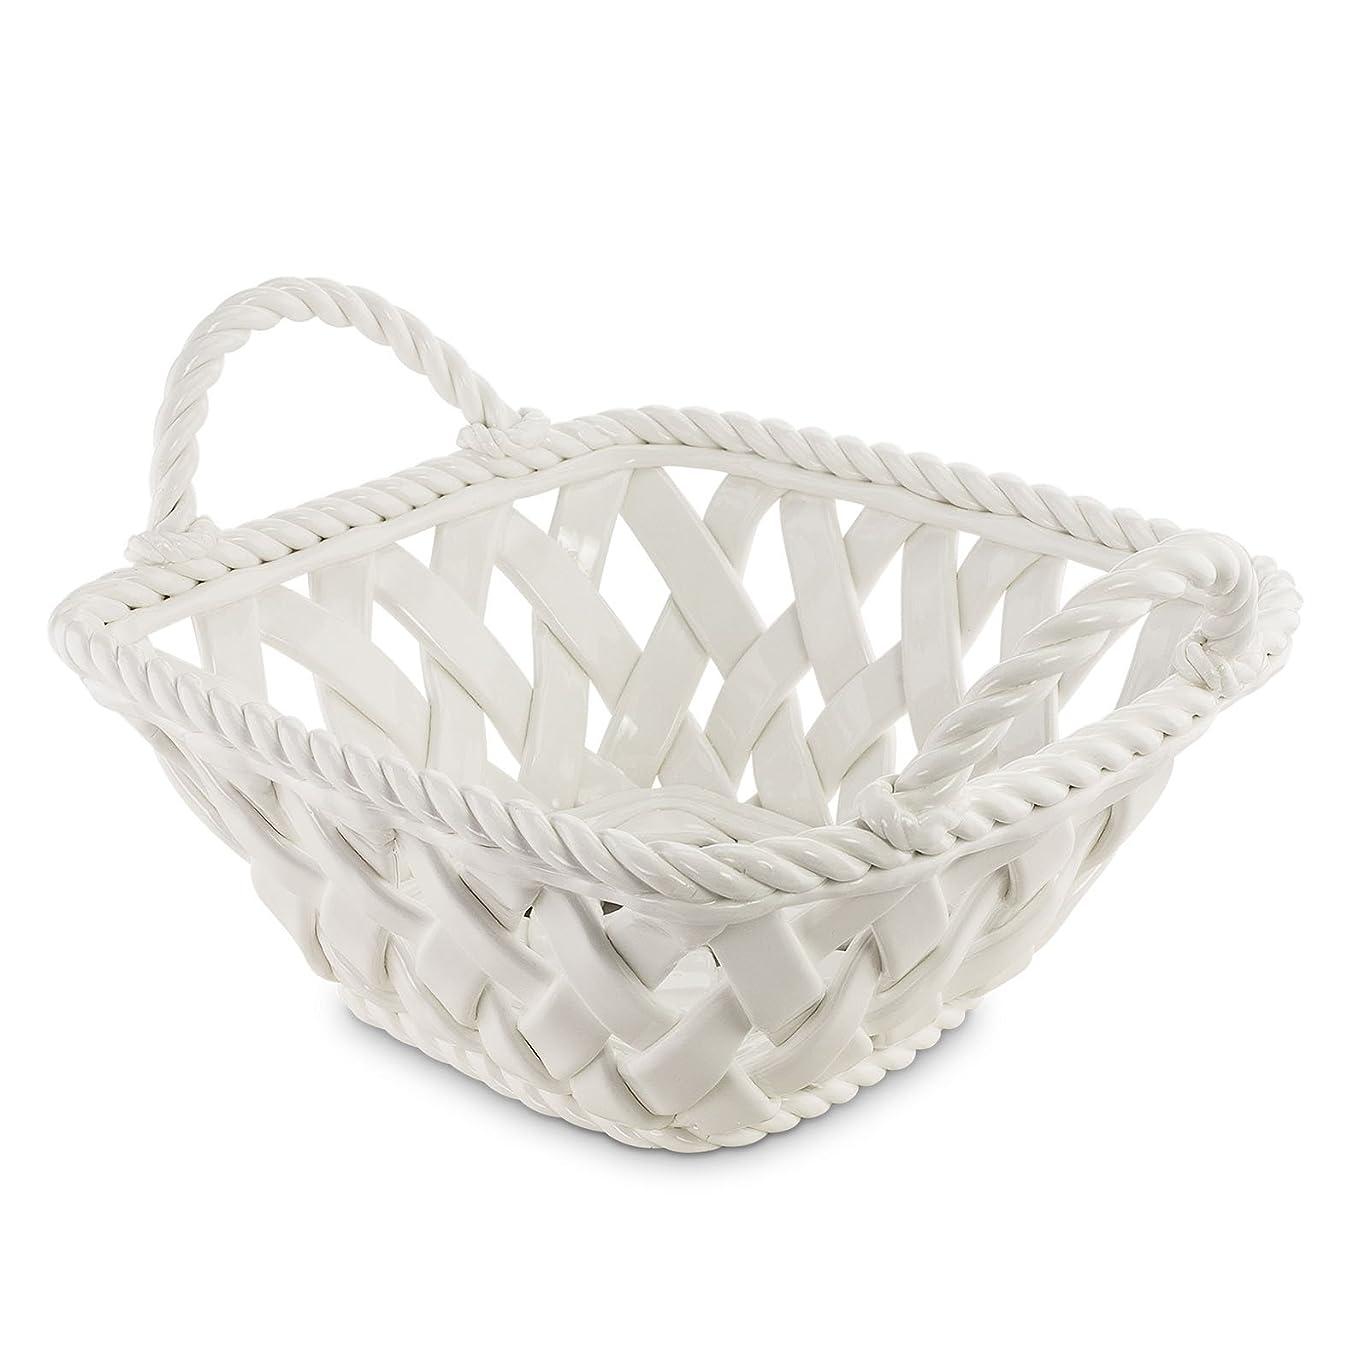 KOVOT Ceramic Woven Serving Basket - Great To Display Bread Or Fruit